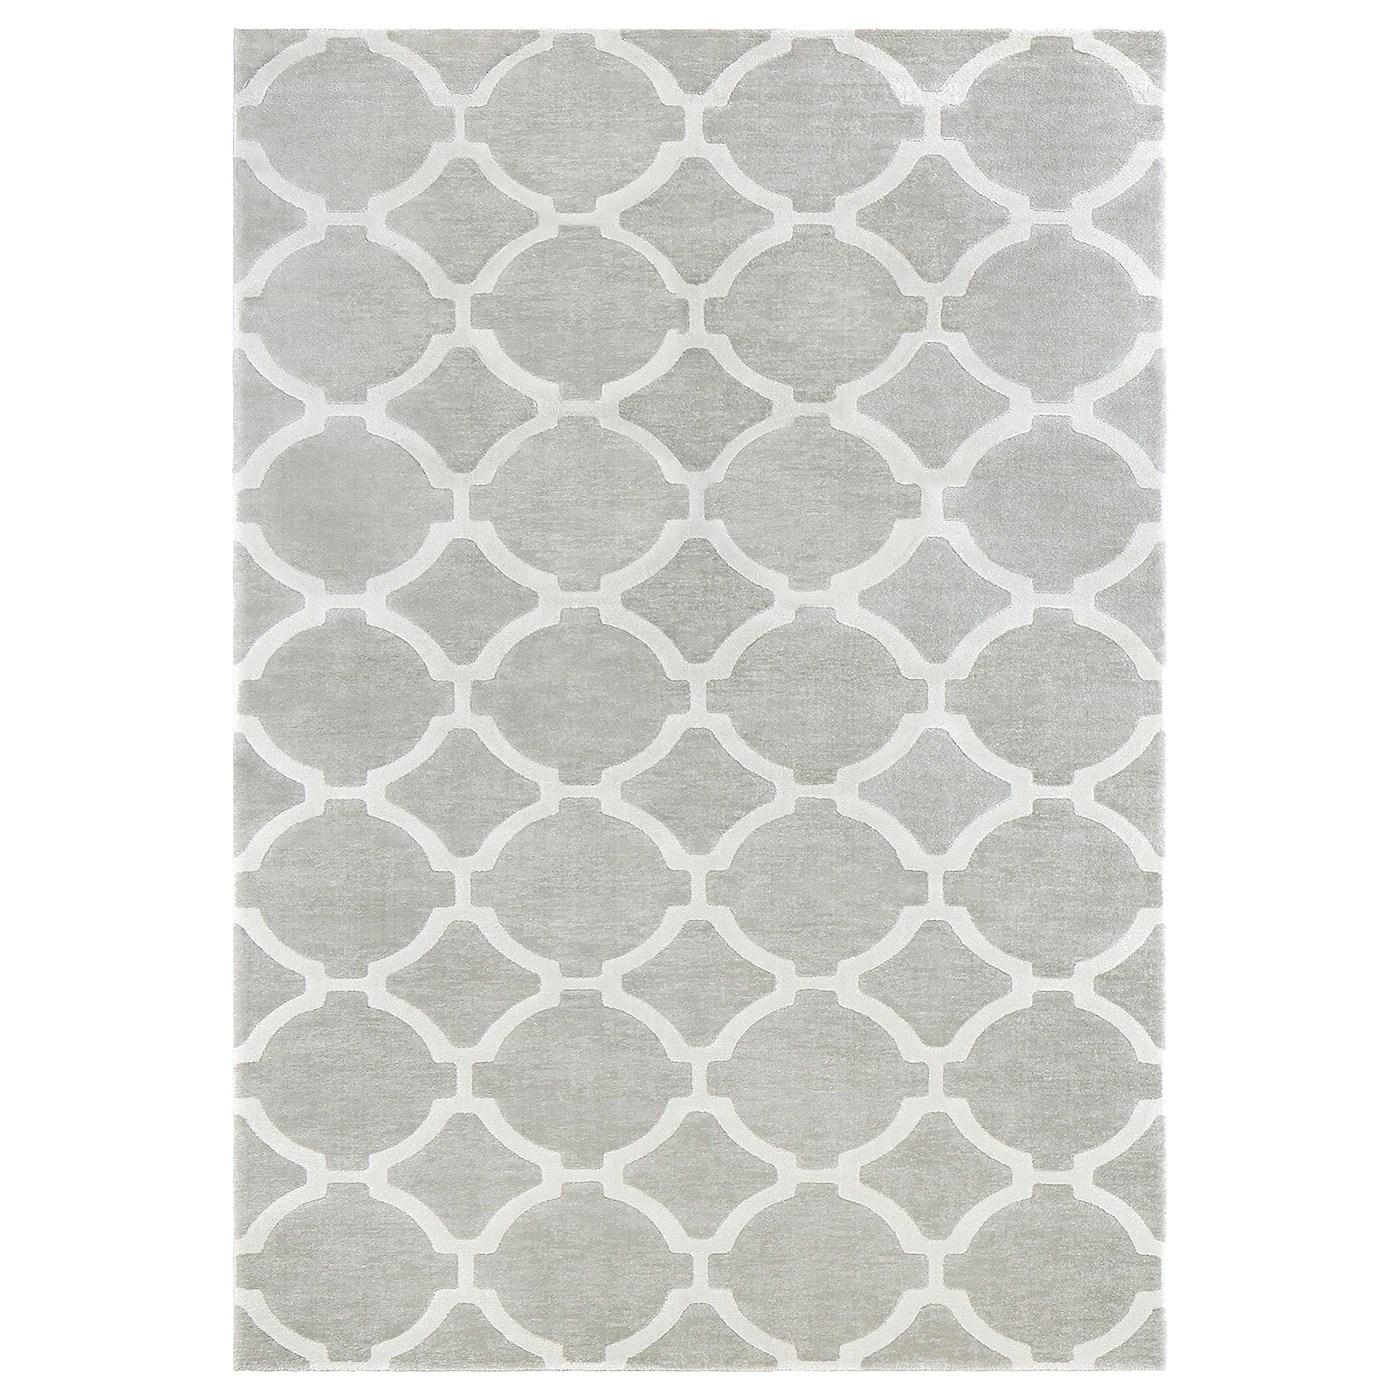 hillested tapis a poils ras gris blanc 6 7 x9 10 200x300 cm